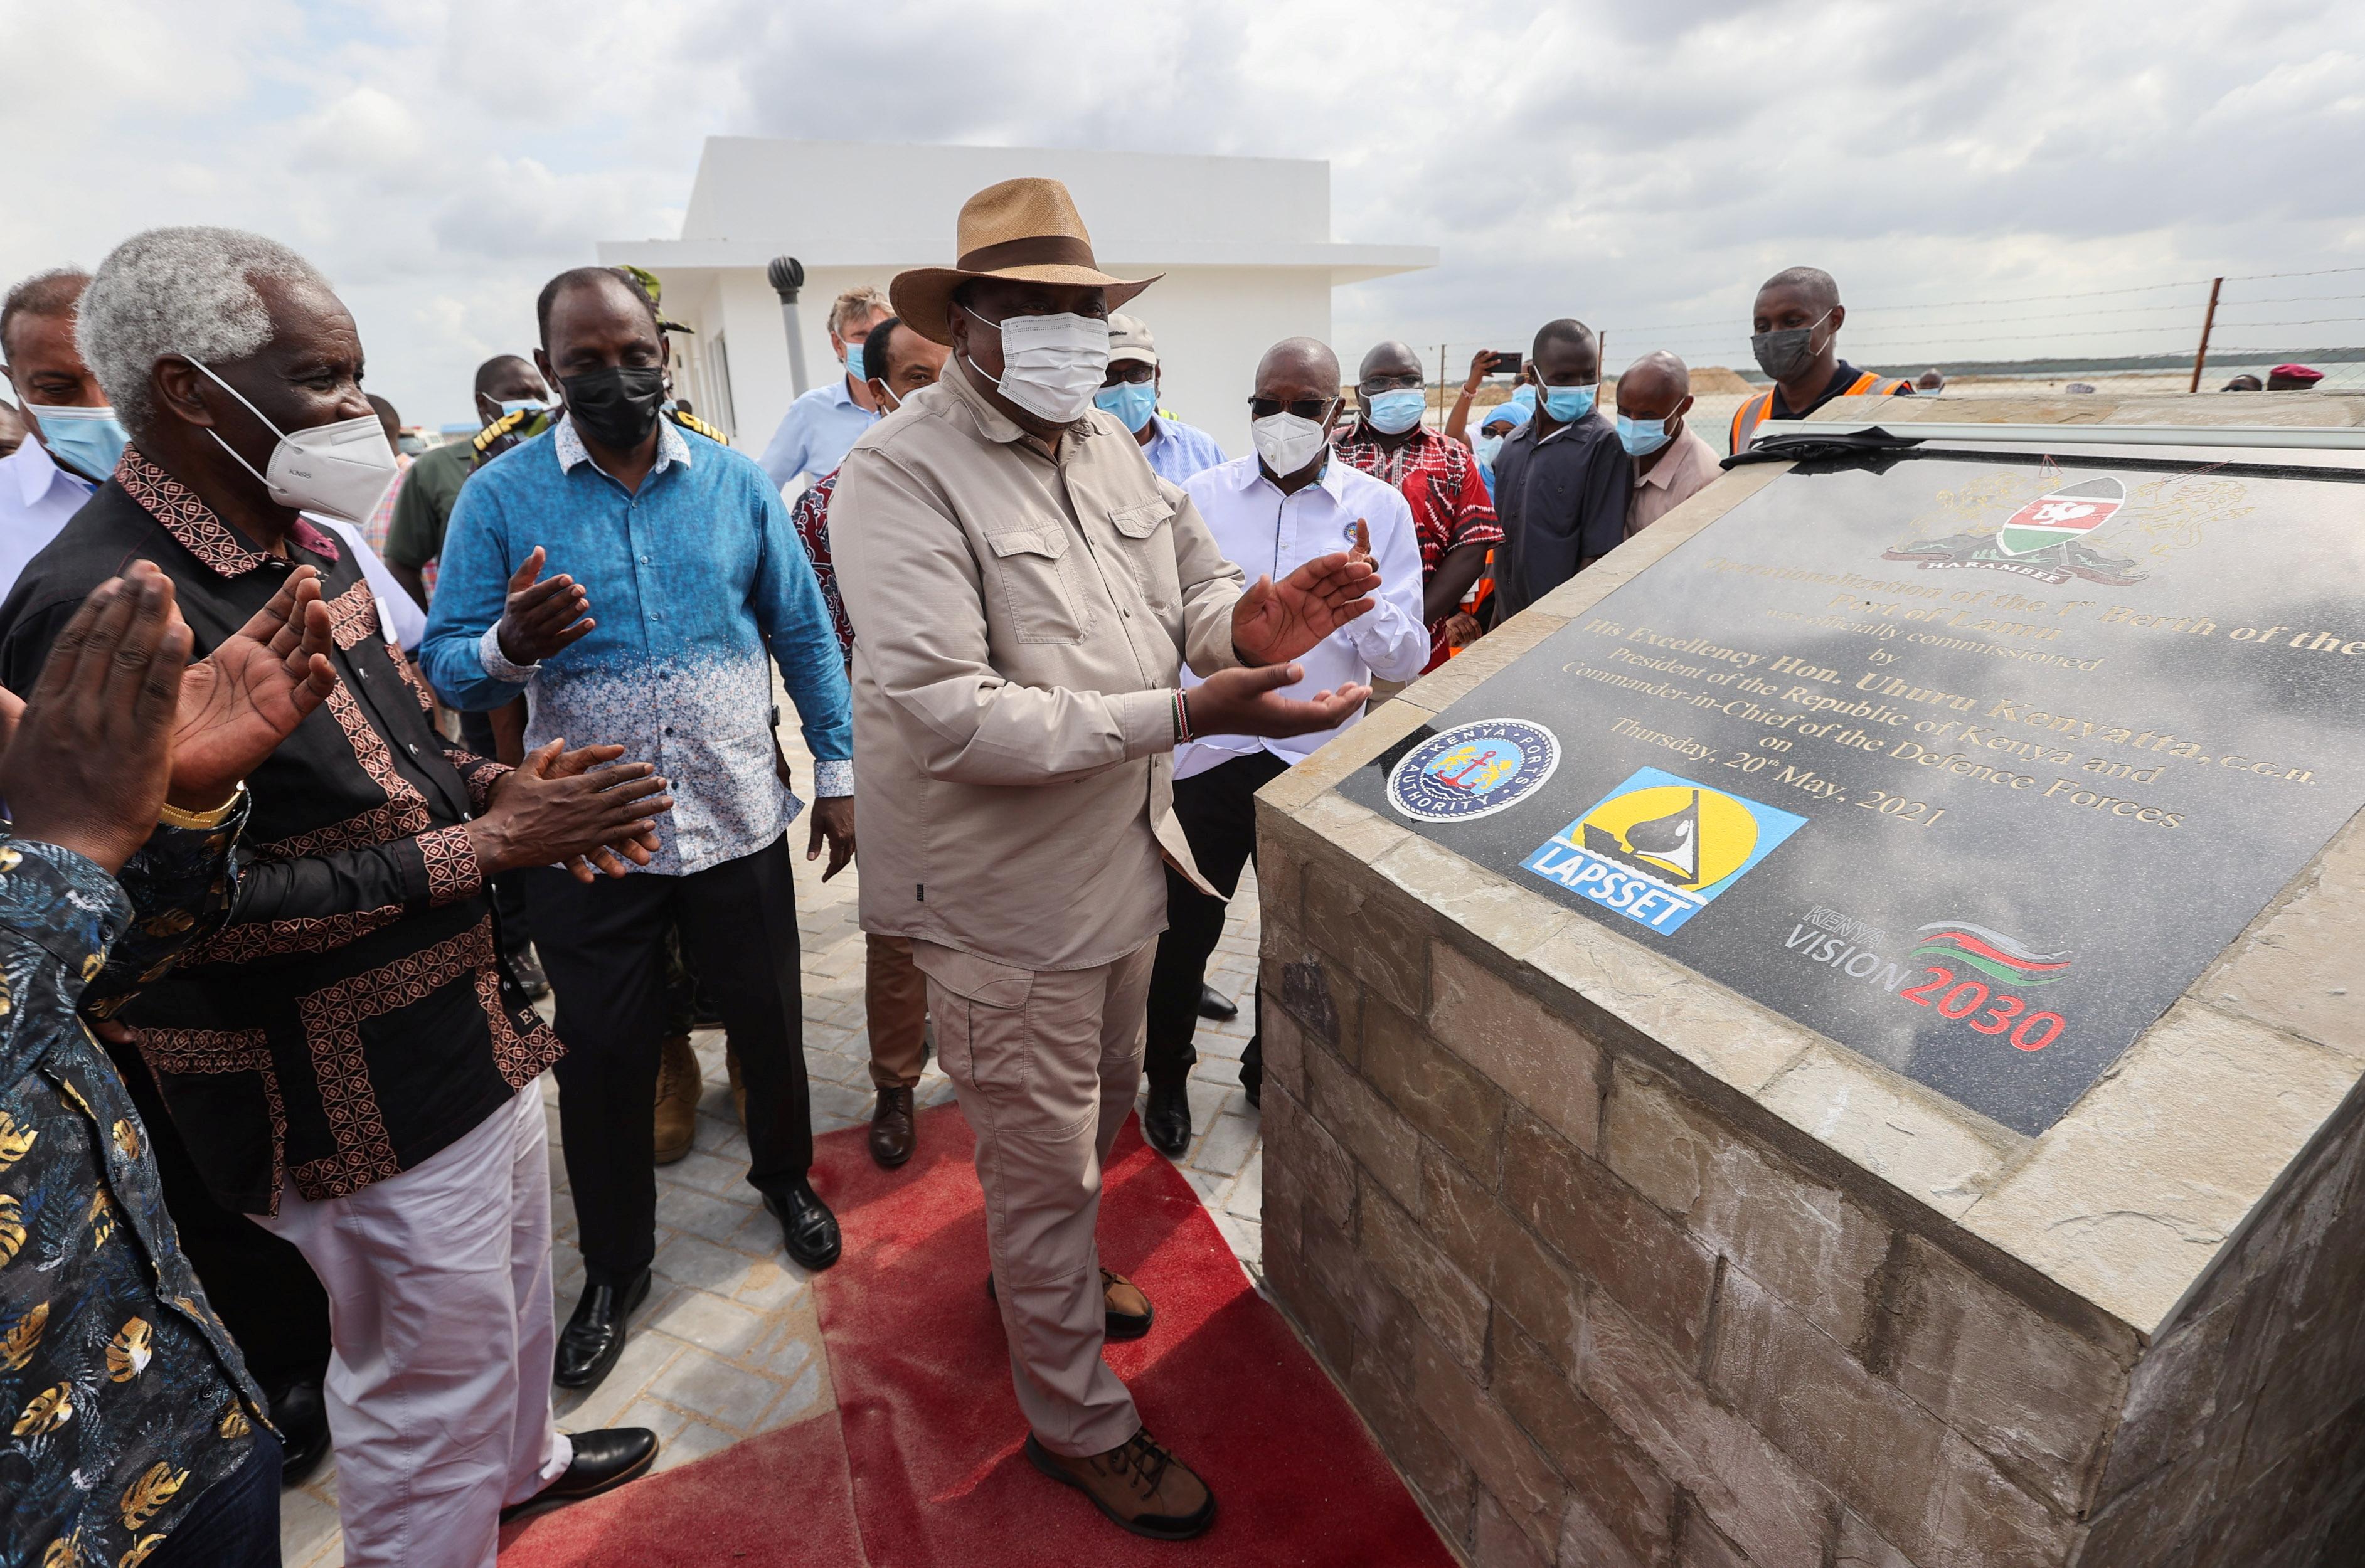 Kenya's President Uhuru Kenyatta unveils the first berth of Chinese funded Lamu Port in Lamu, Kenya May 20, 2021. Presidential Press Service/Handout via REUTERS